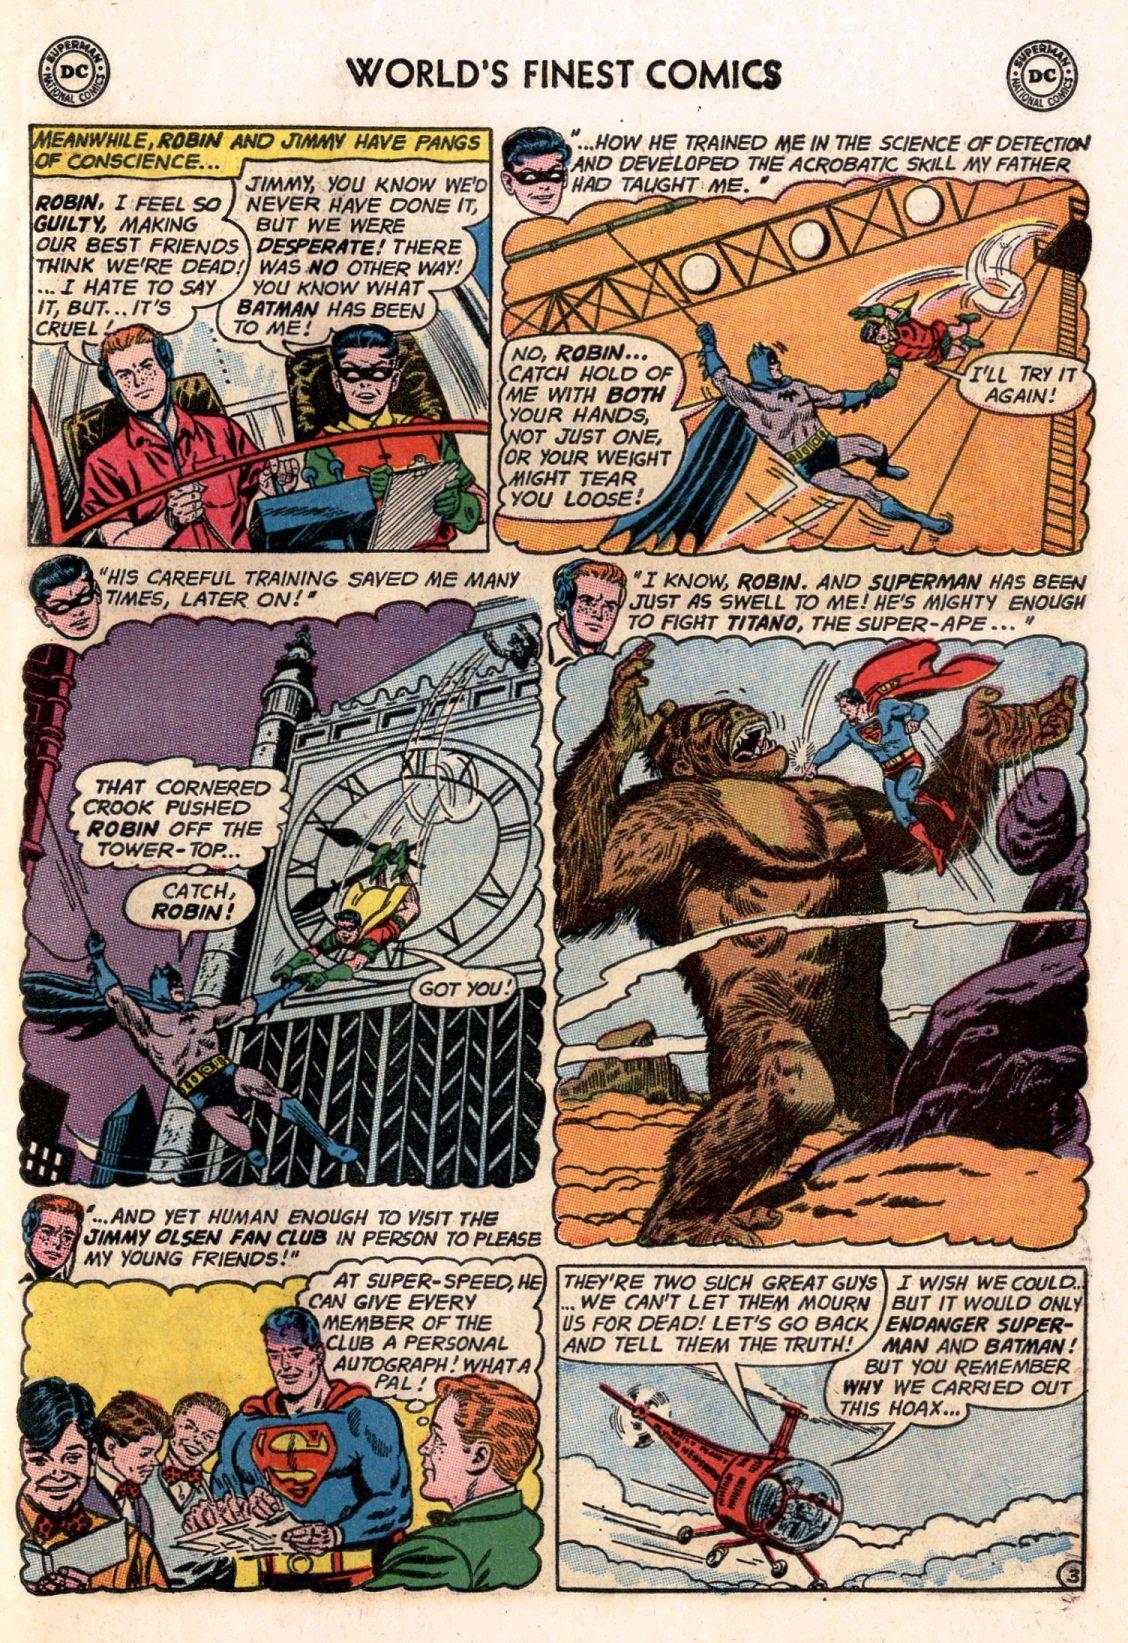 Read online World's Finest Comics comic -  Issue #141 - 15